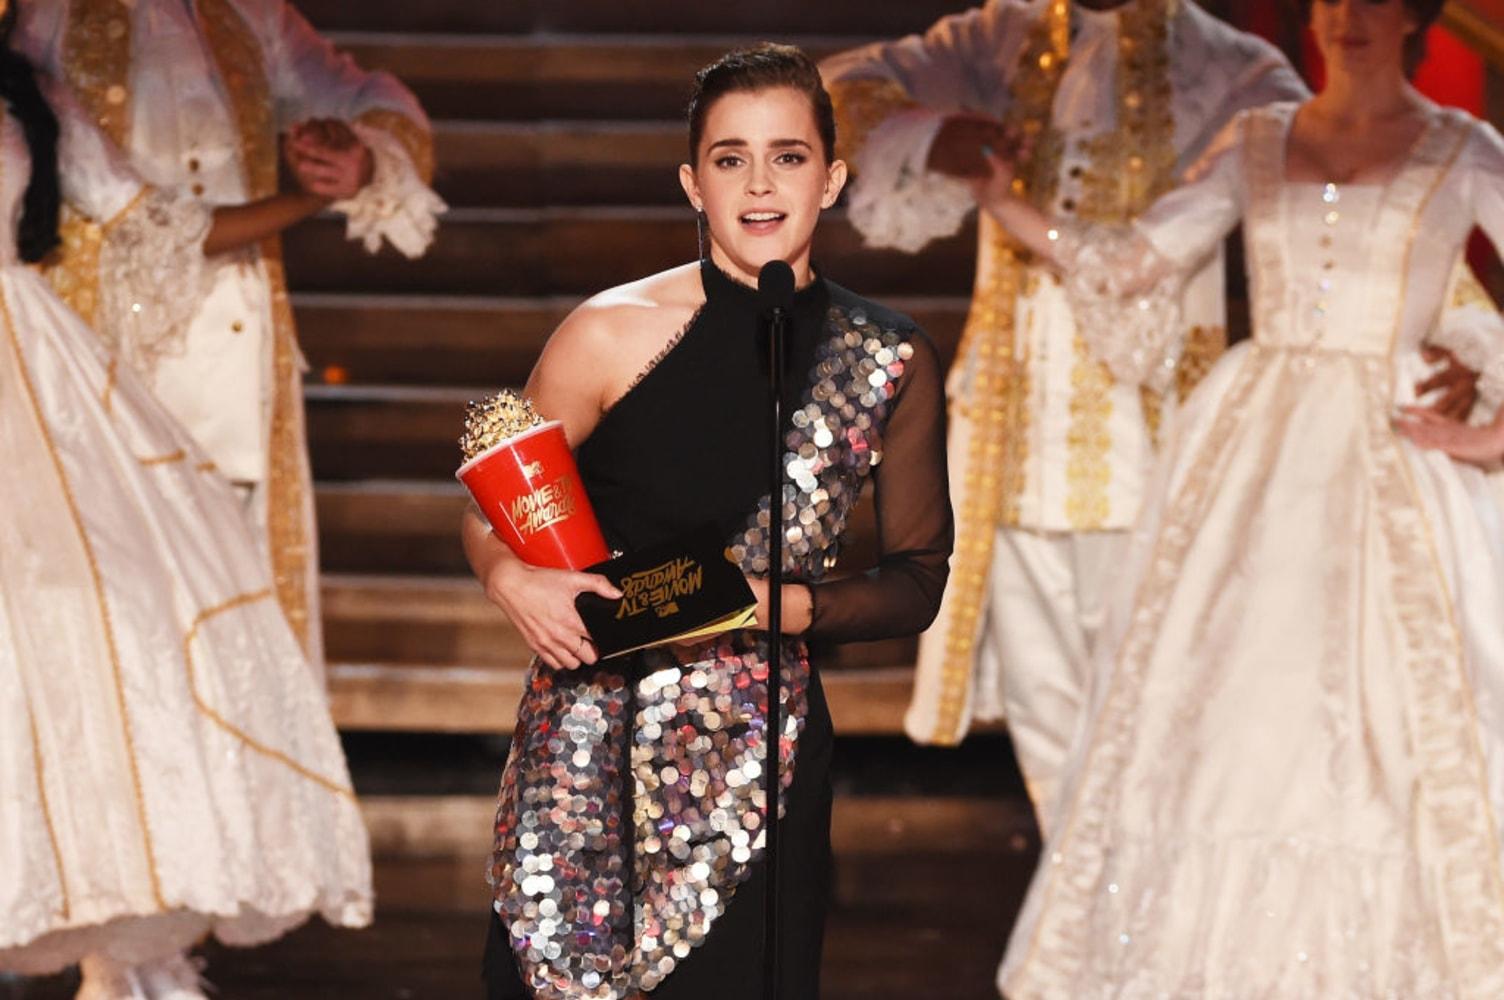 Emma Watson wins MTV's first gender-neutral acting nod